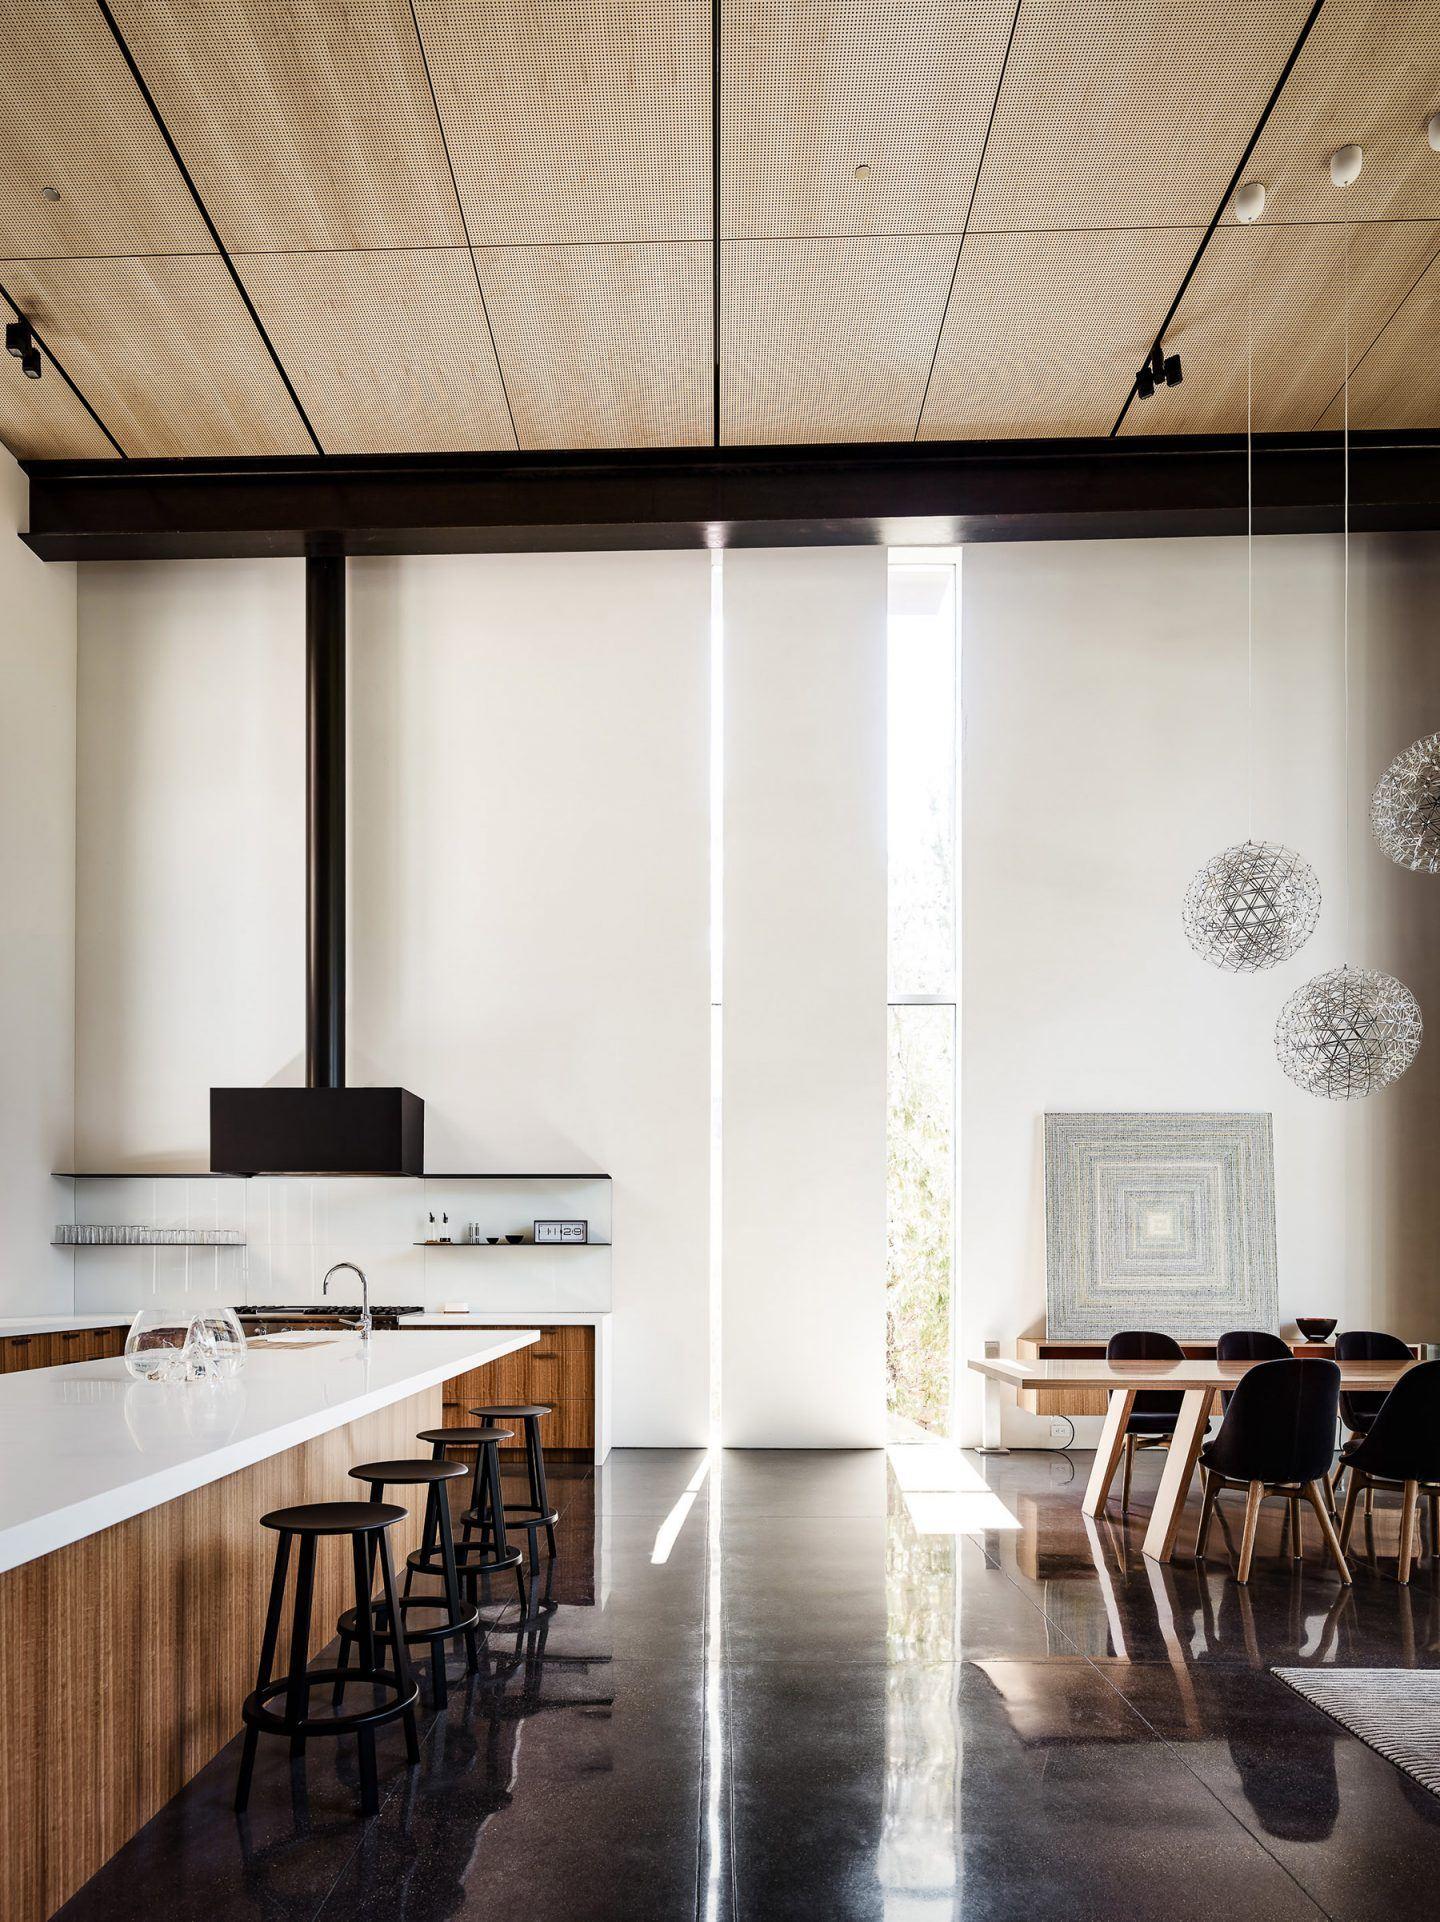 IGNANT-Architecture-Faulkner-Architects-Burnt-Cedar-012